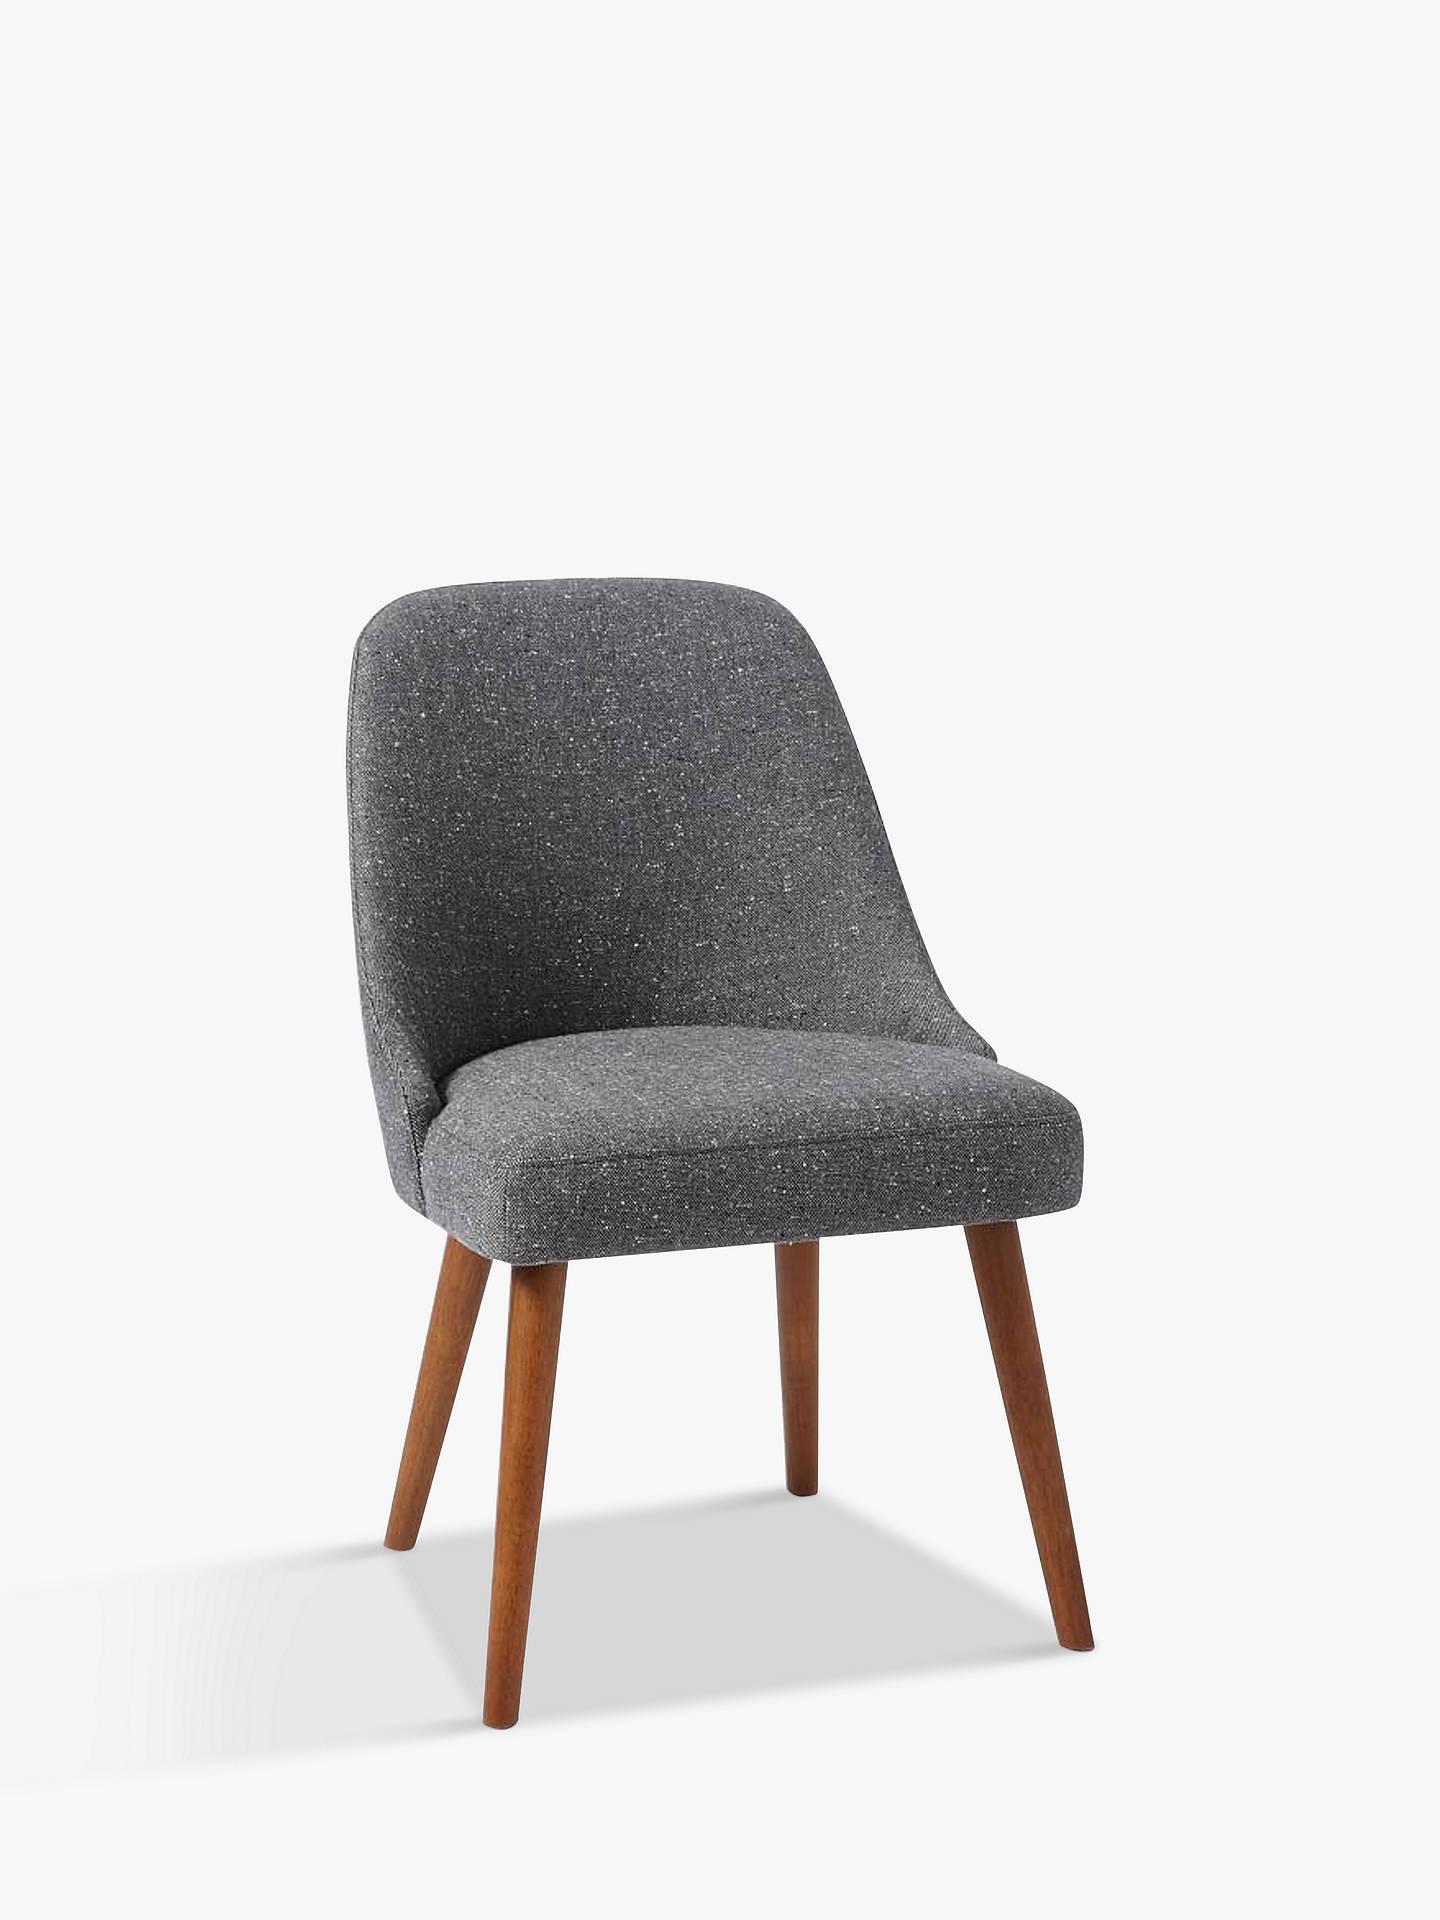 West Elm Mid Century Dining Chair Salt And Pepper Tweed Online At Johnlewis